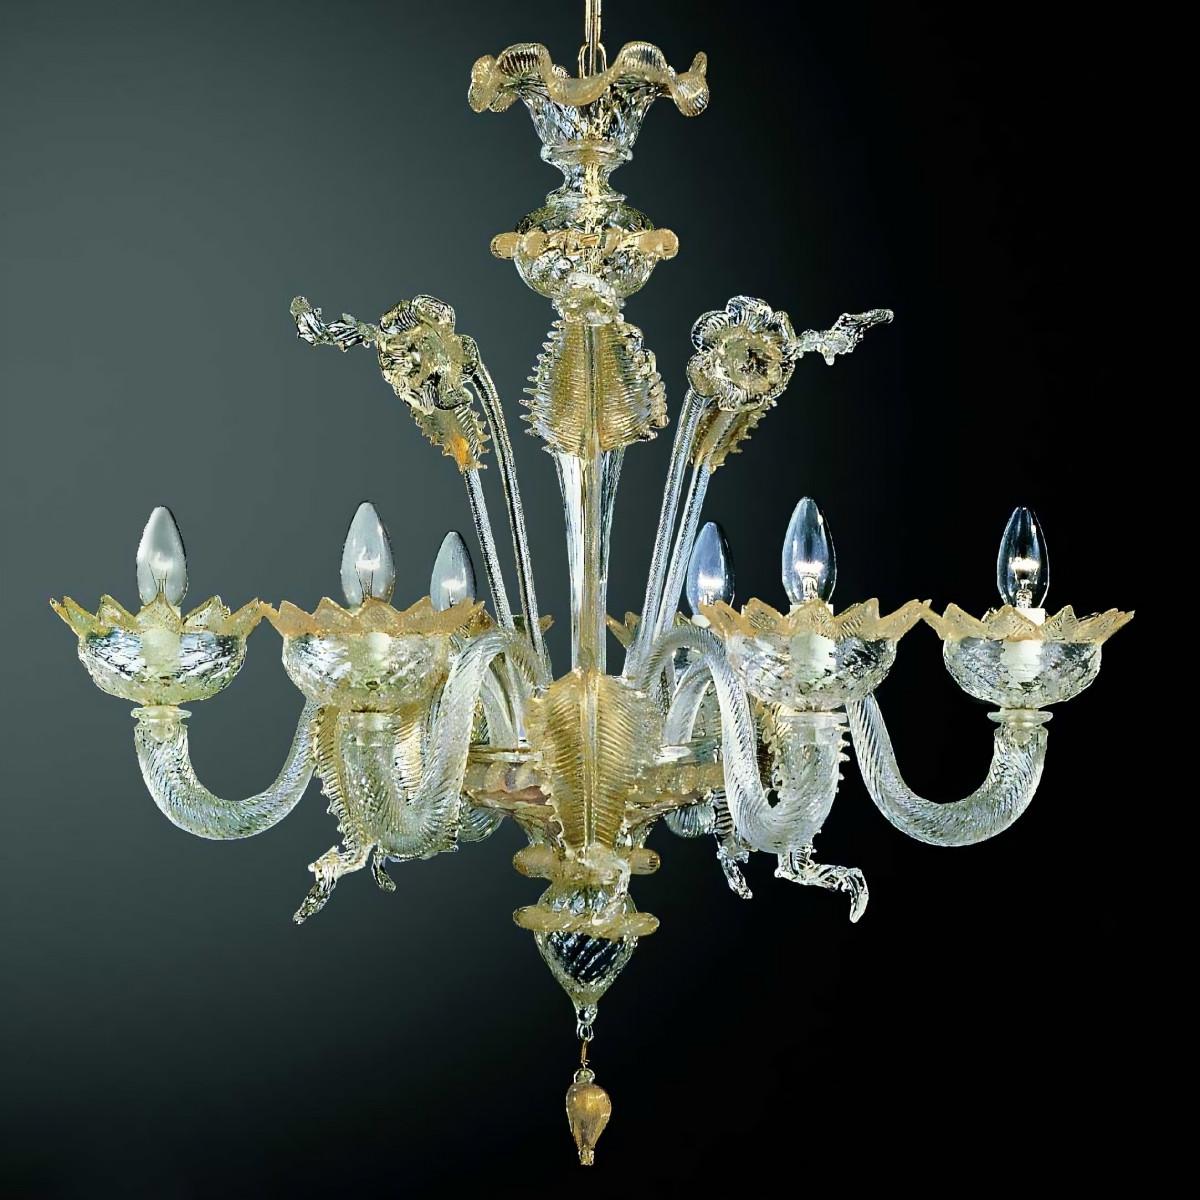 Casanova 6 flammig Murano Kronleuchter Farbe transparente Gold